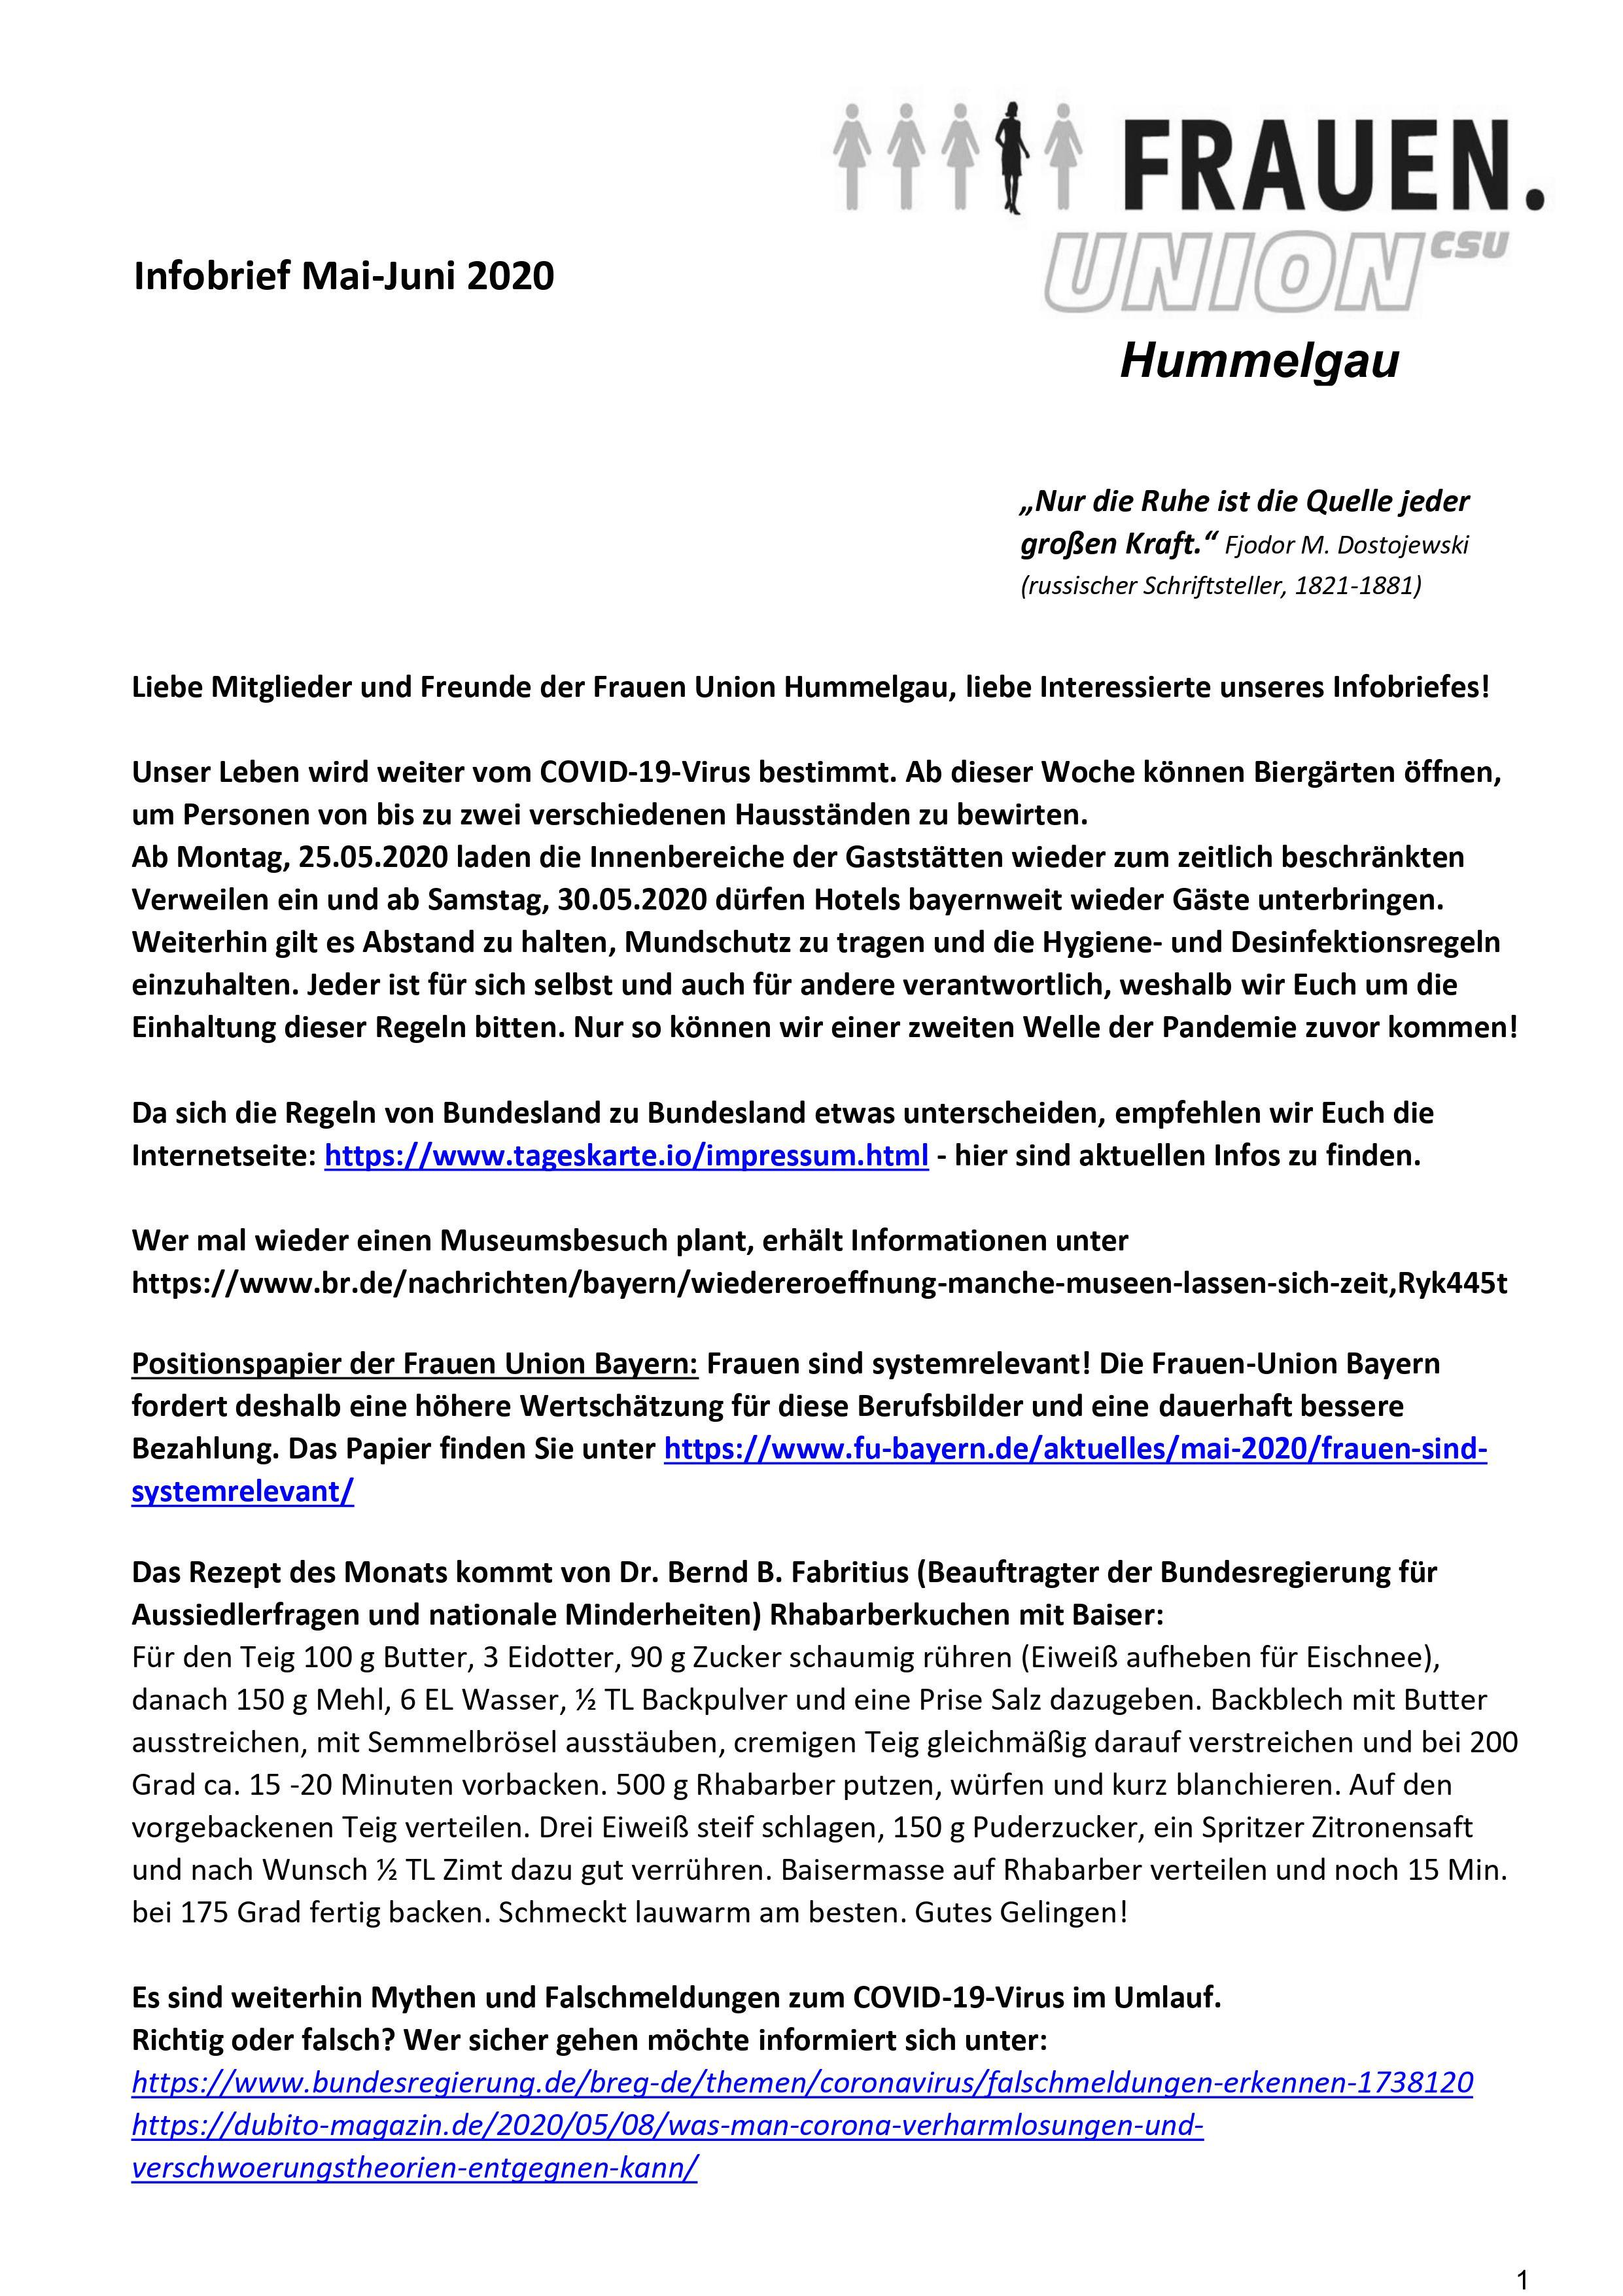 Infobrief Mai-Juni 2020 - Frauenunion Hummelgau 1